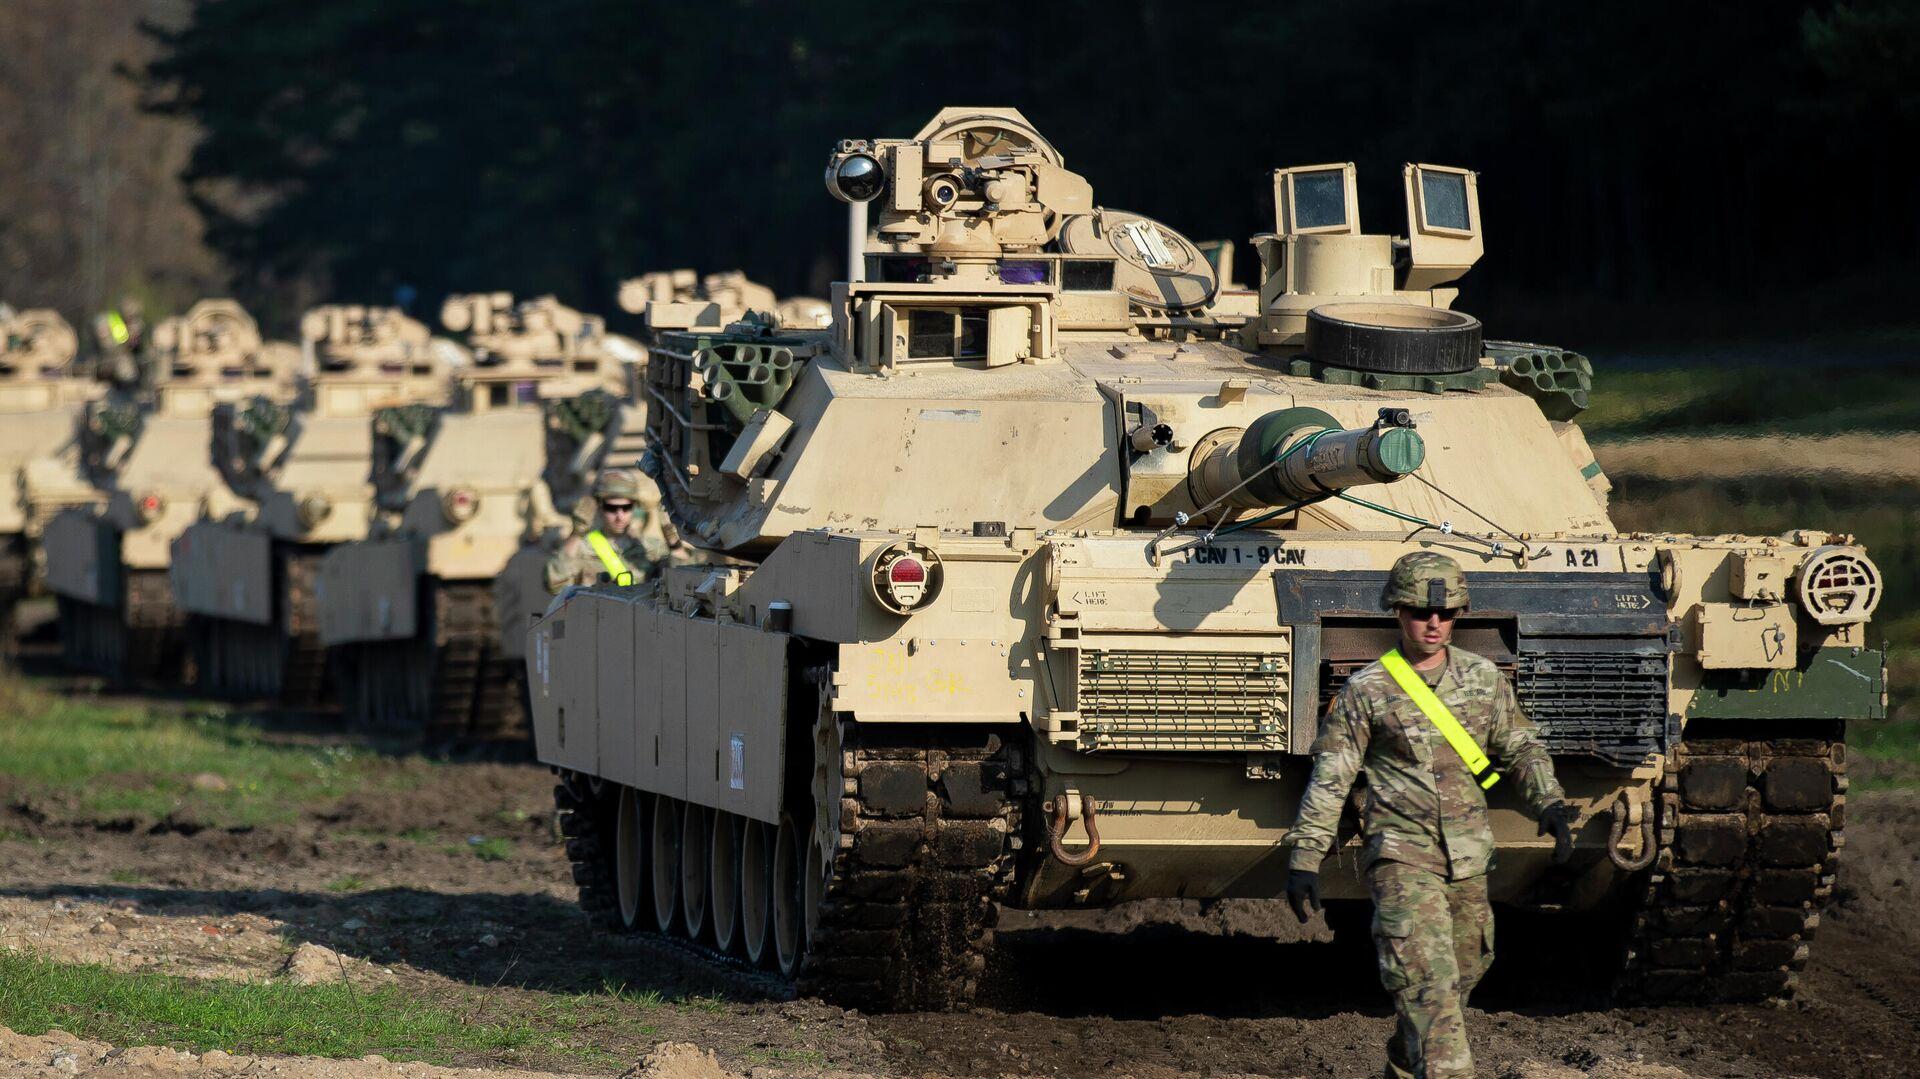 Американские танки Абрамс в городе Пабраде, Литва. 21 октября 2019 - РИА Новости, 1920, 26.05.2020